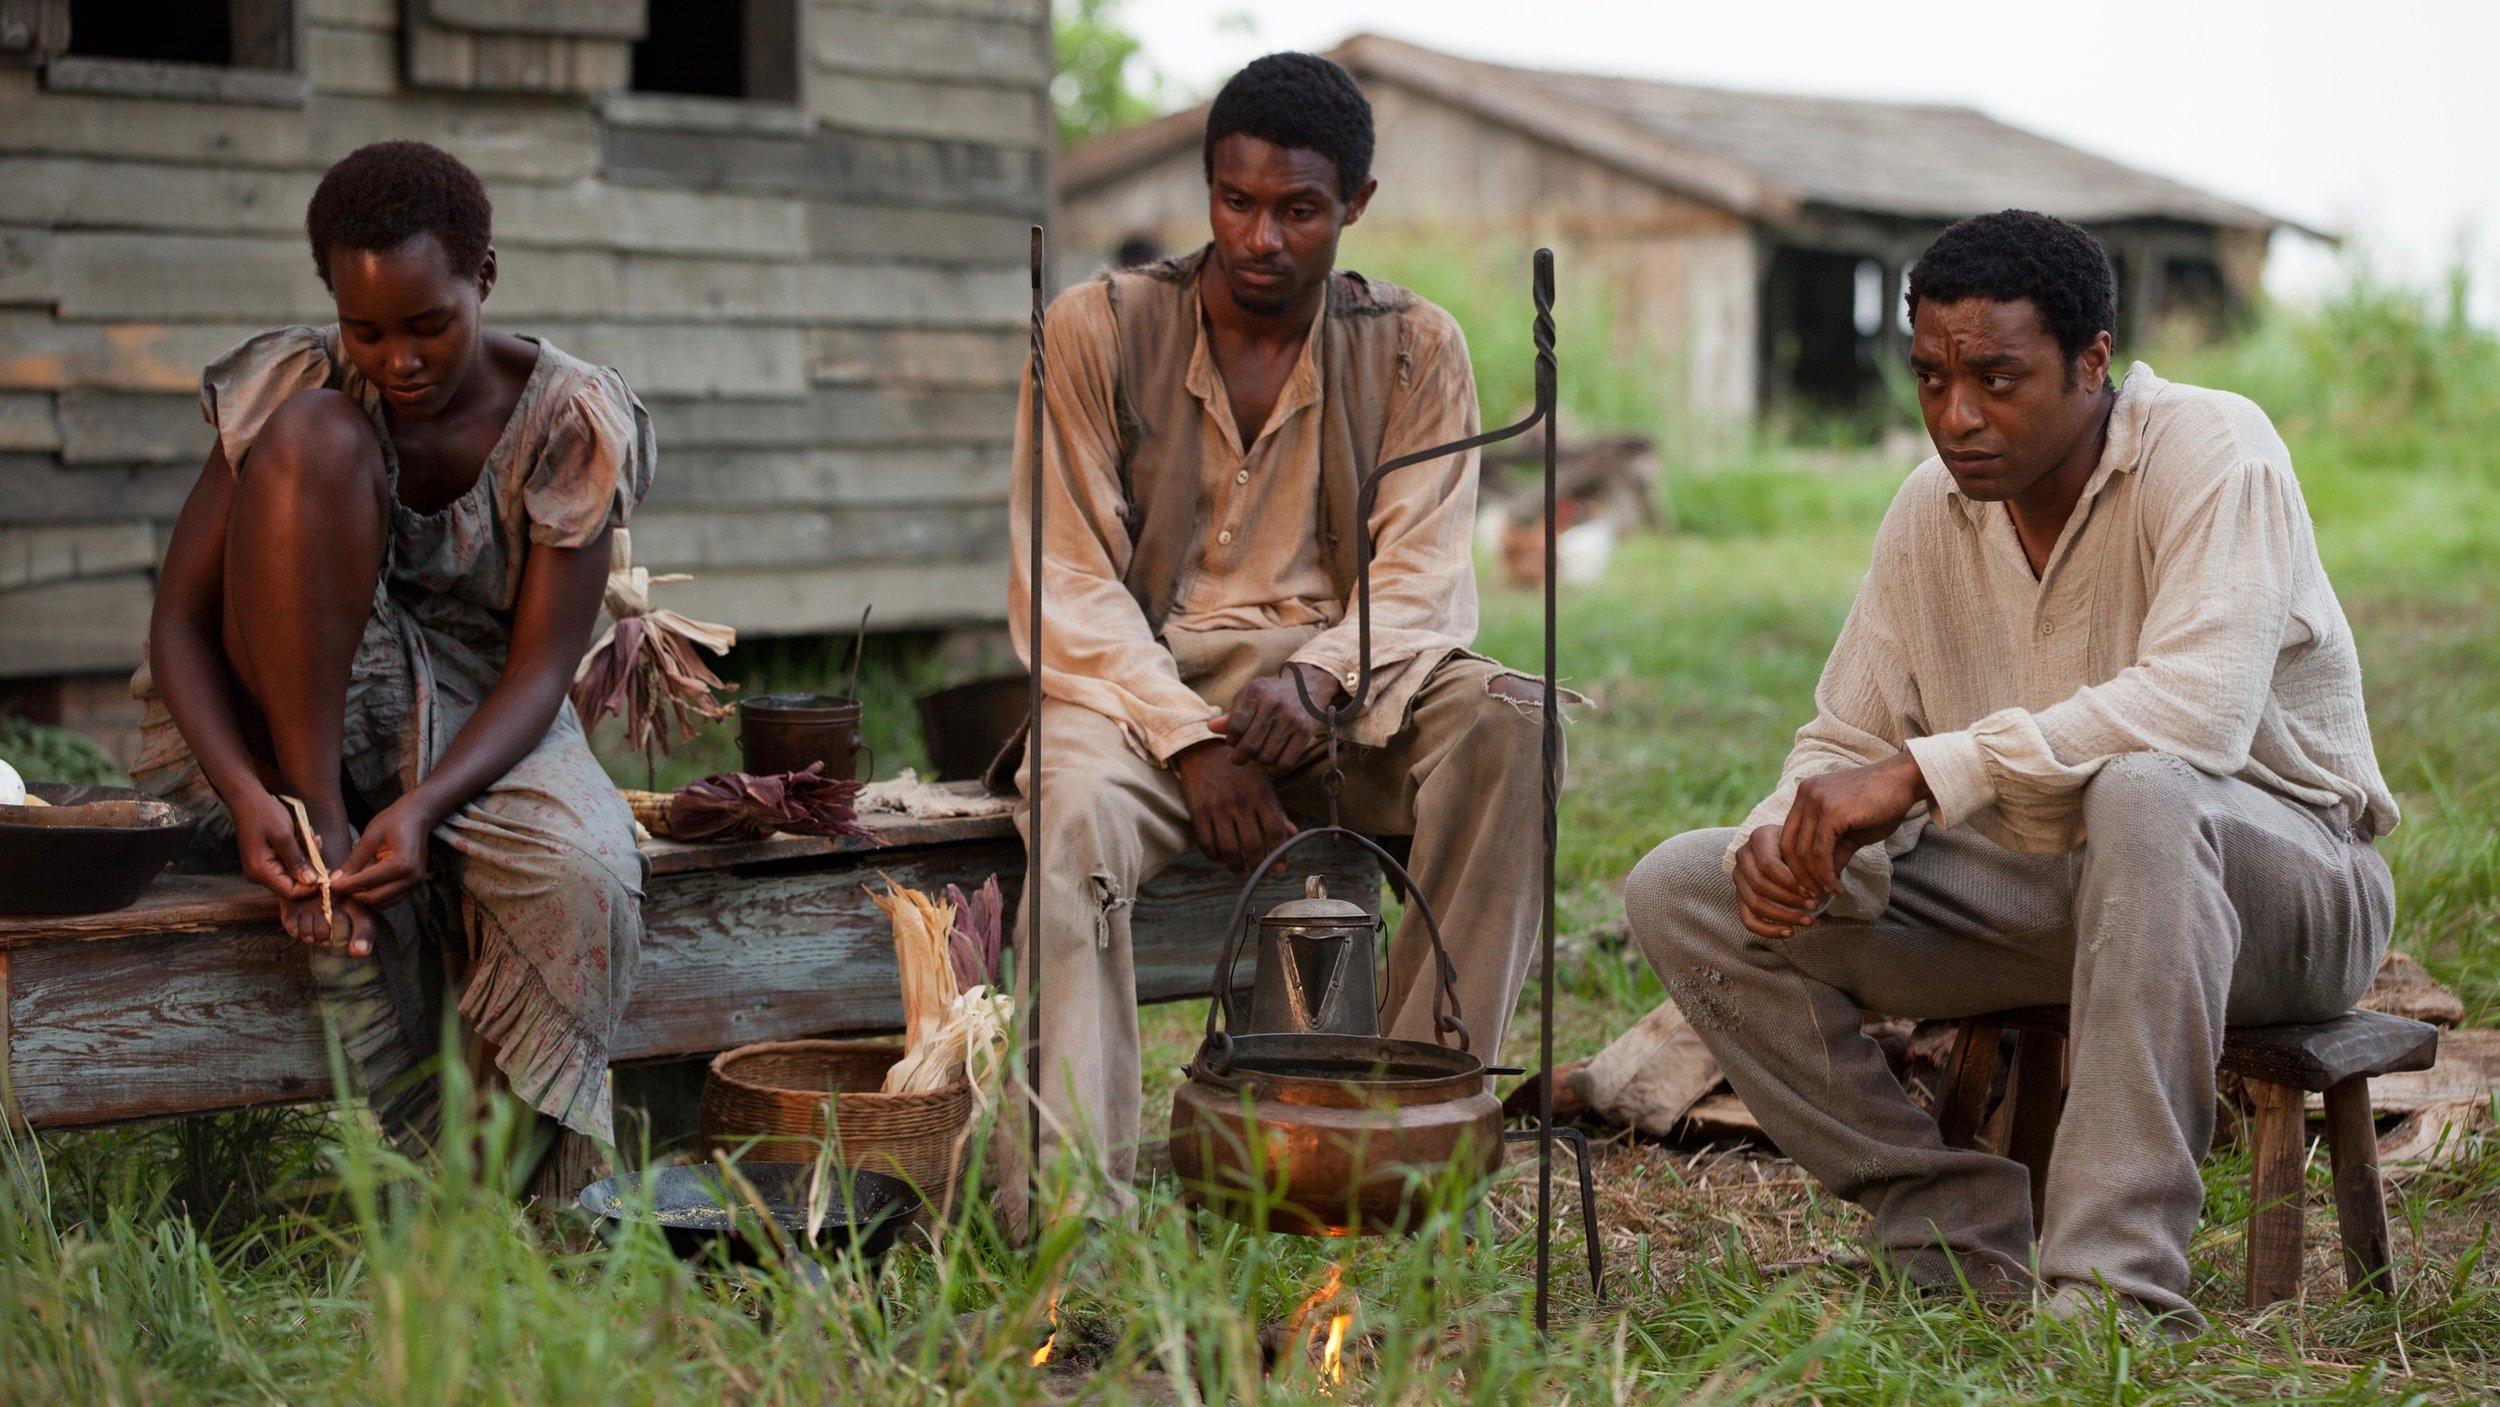 12-years-a-slave-chiwetel-ejiofor-lupita-nyongo (1).jpg